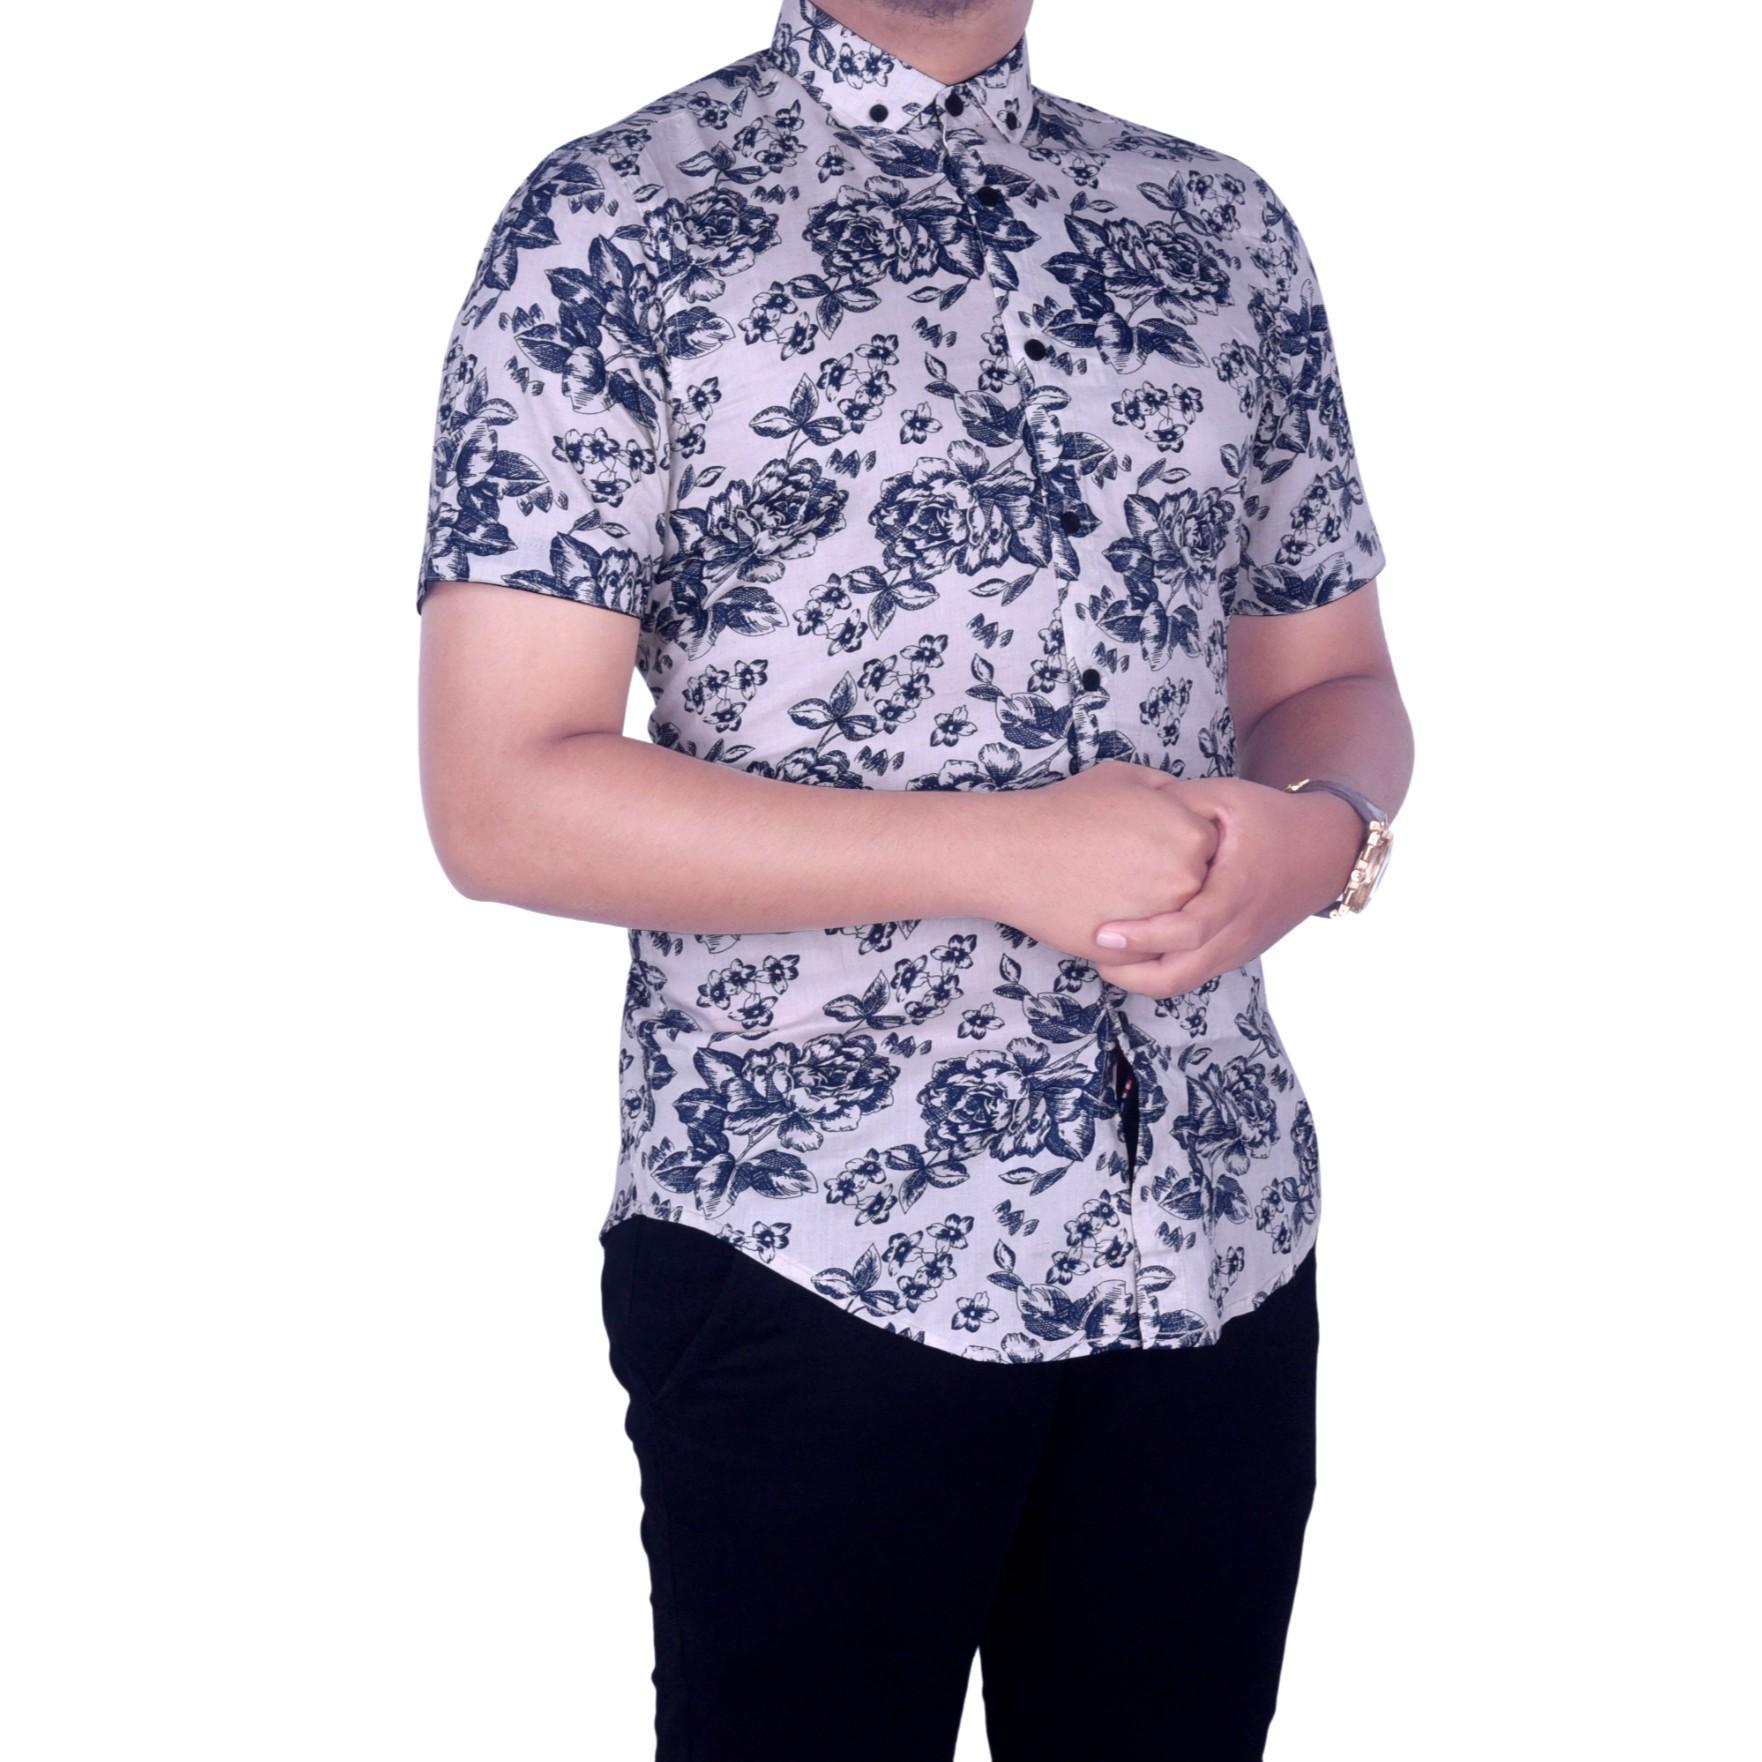 Dgm_Fashion1 Kemeja Pendek Pria PANTAI/Kemeja Polos/Kemeja Batik/Kemeja Casual/Kemeja Men/Kemeja Ox